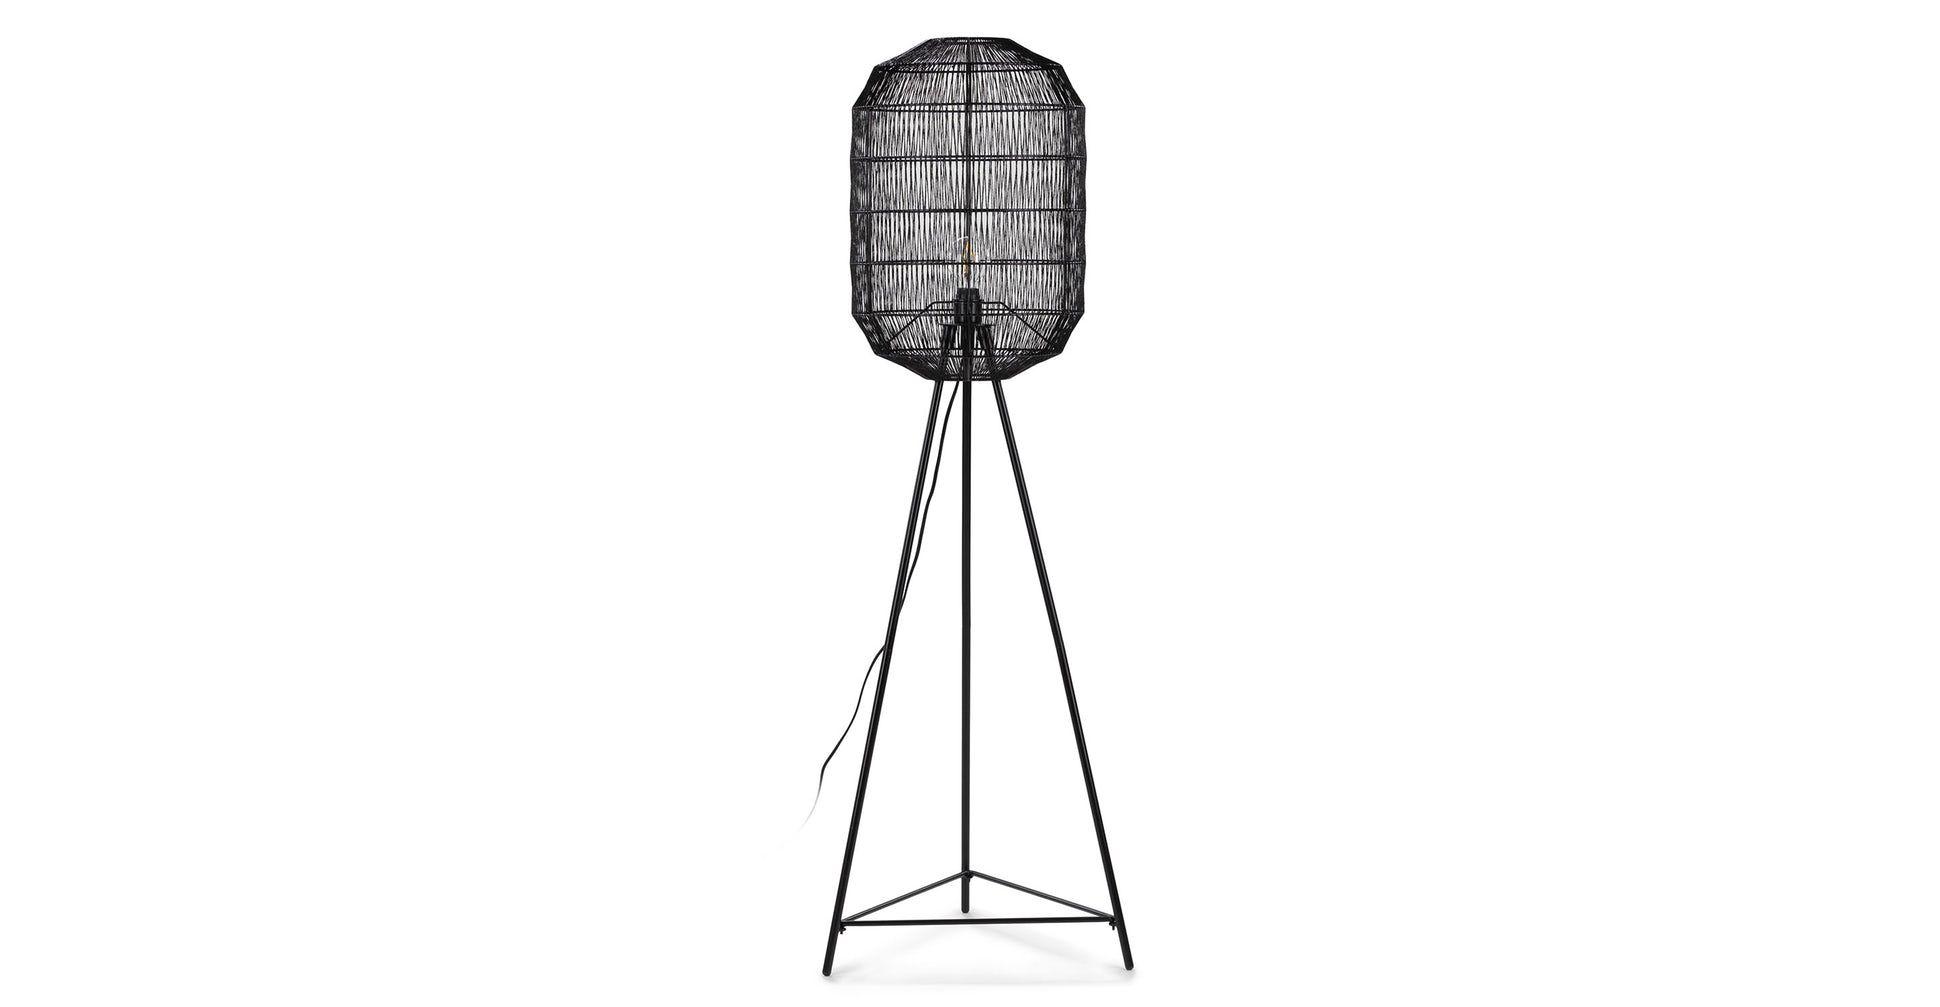 Ochin Floor Lamp in 2020 Floor lamp, Lamp, Modern decor